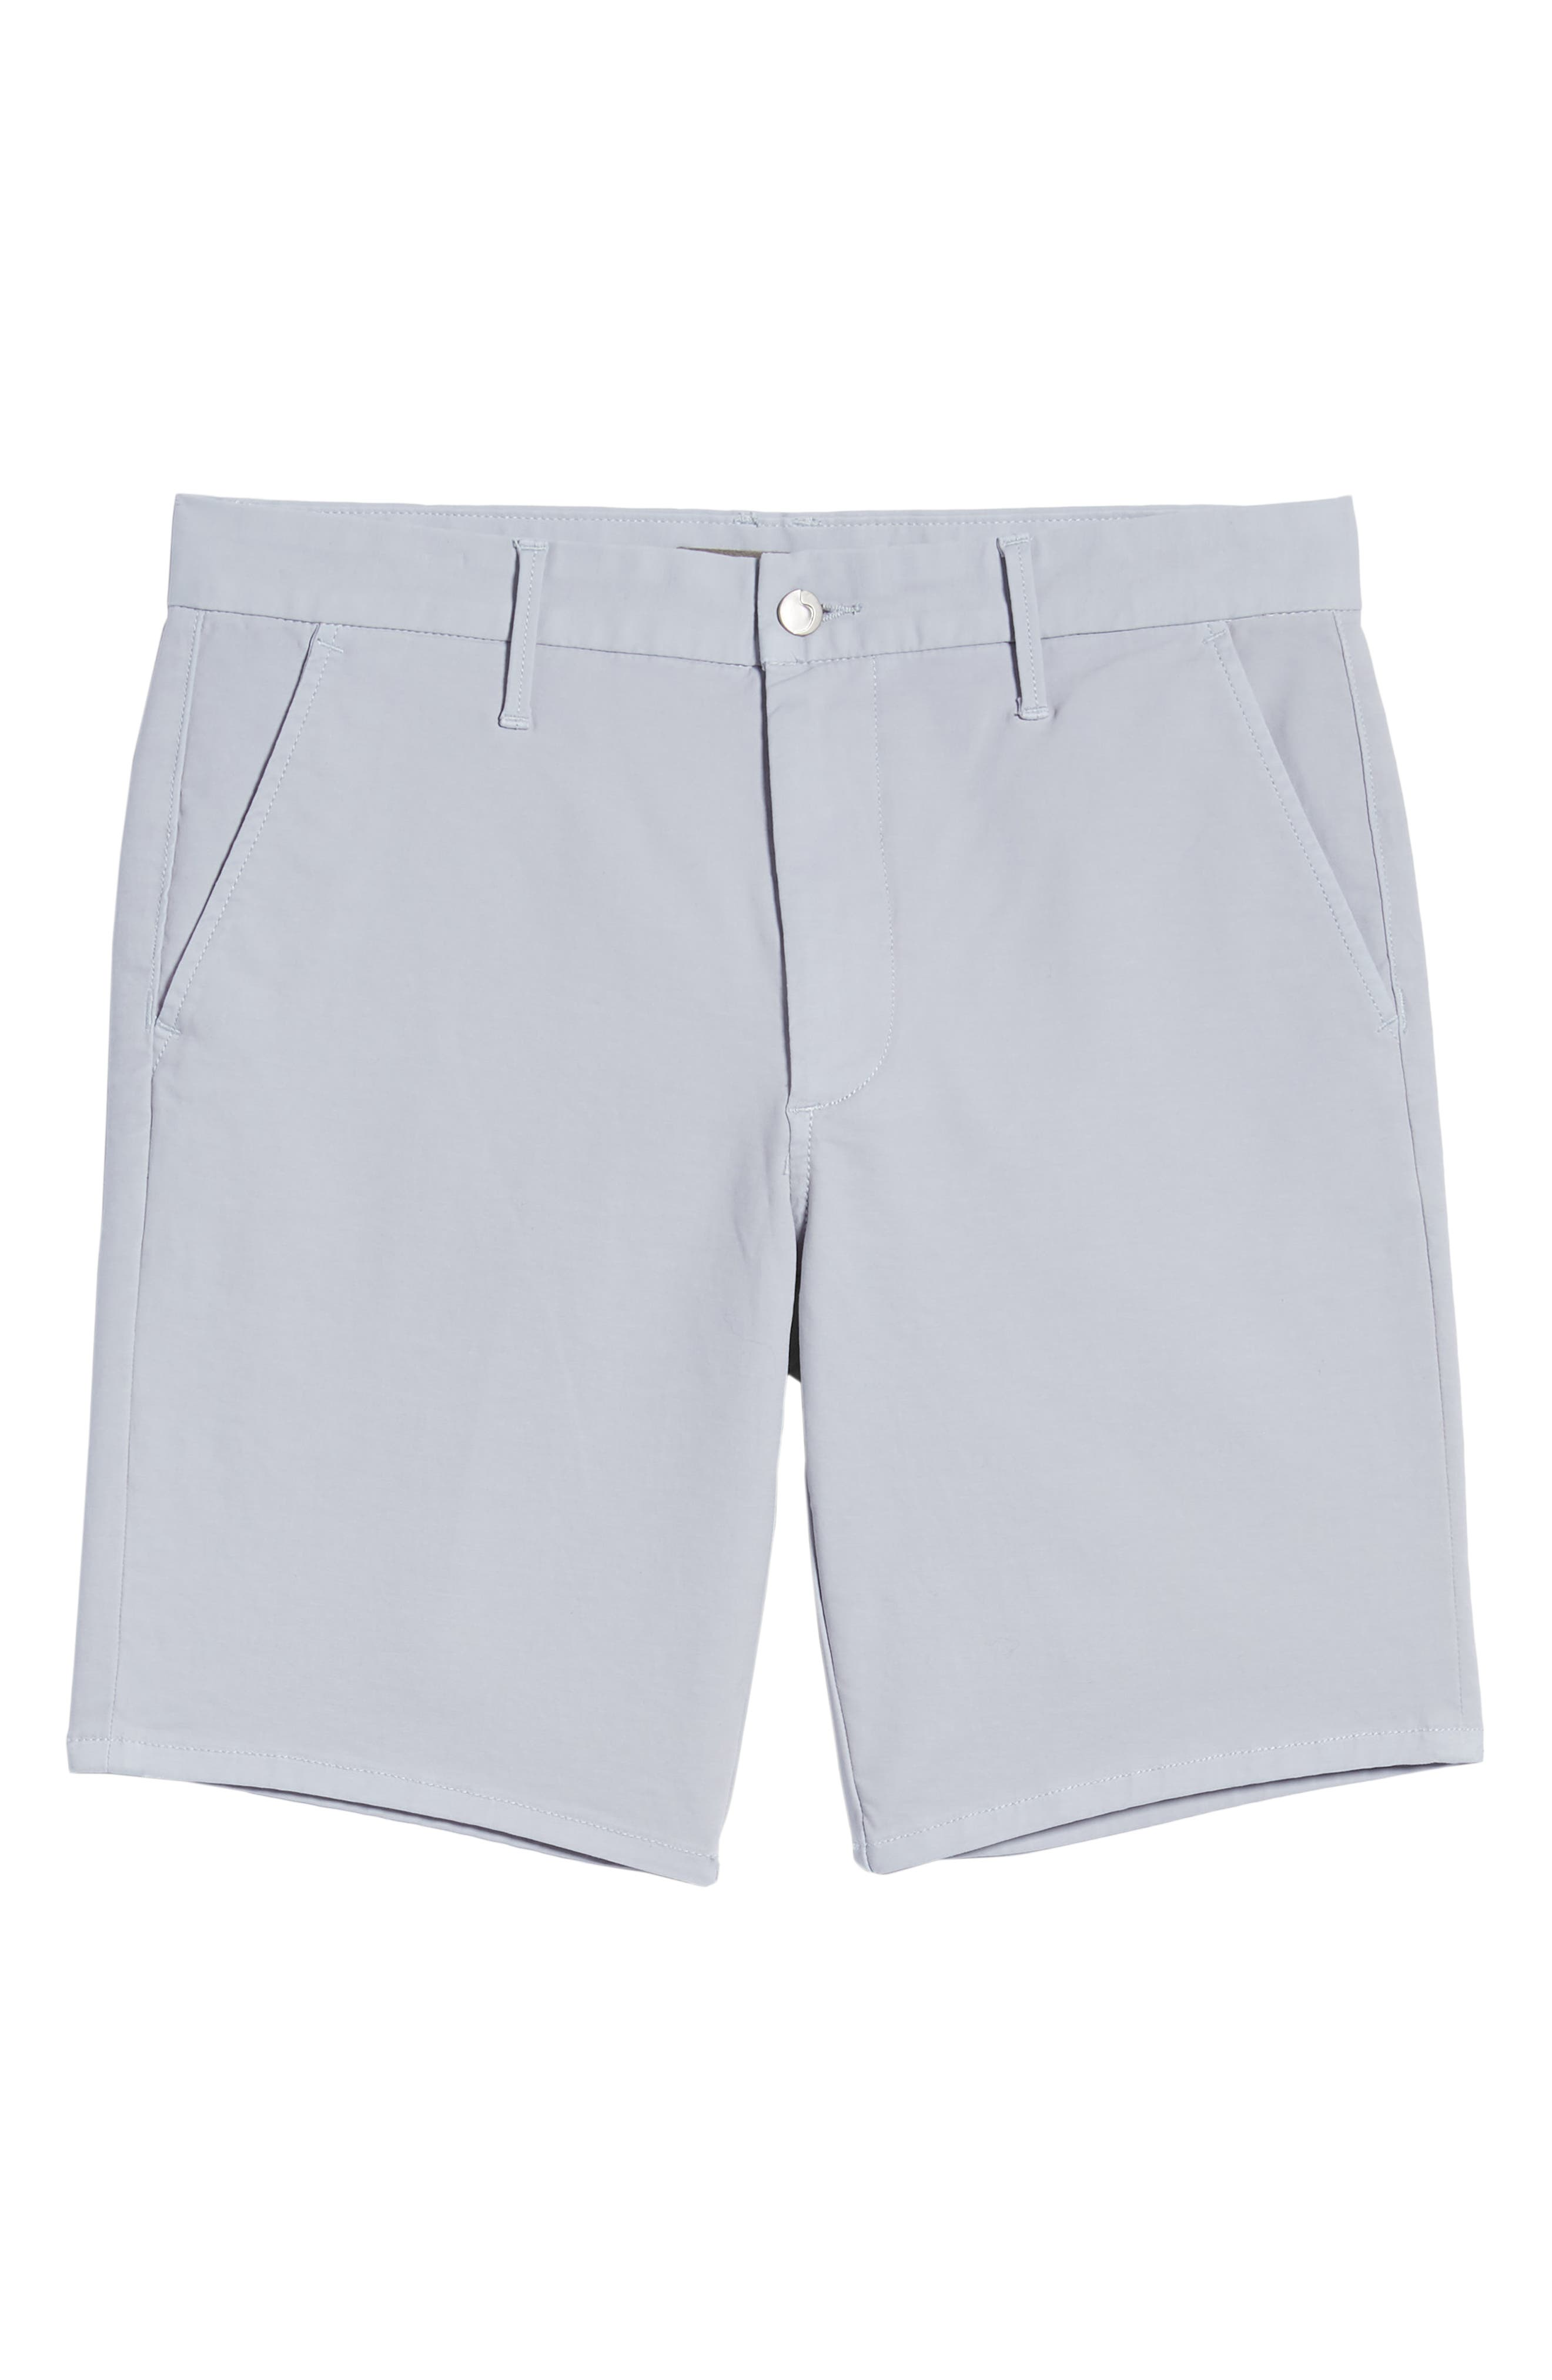 JOE'S,                             Brixton Trim Fit Straight Leg Shorts,                             Alternate thumbnail 6, color,                             GREY DAWN